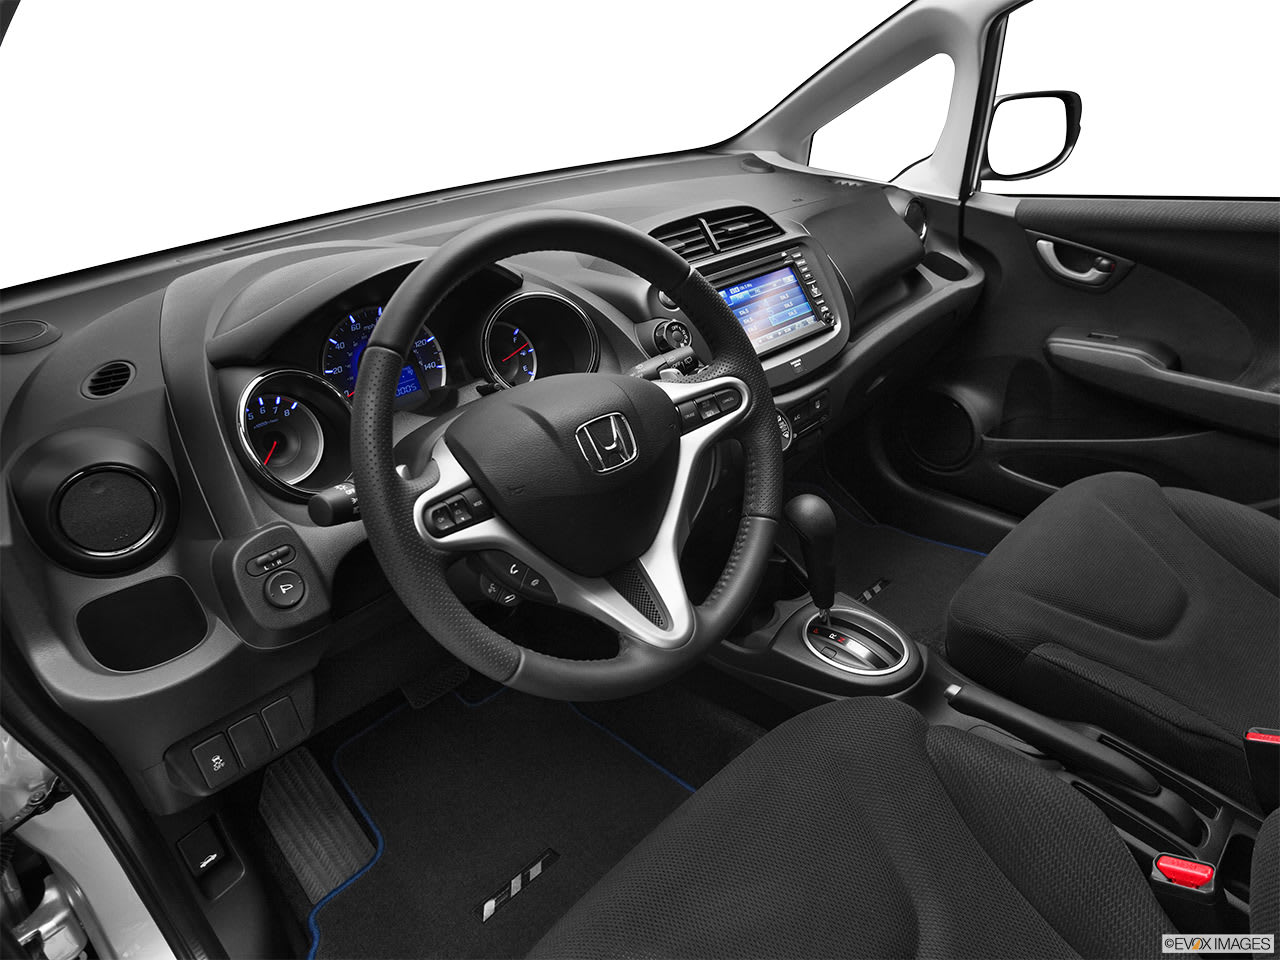 Honda Fit EV 2012 Interior